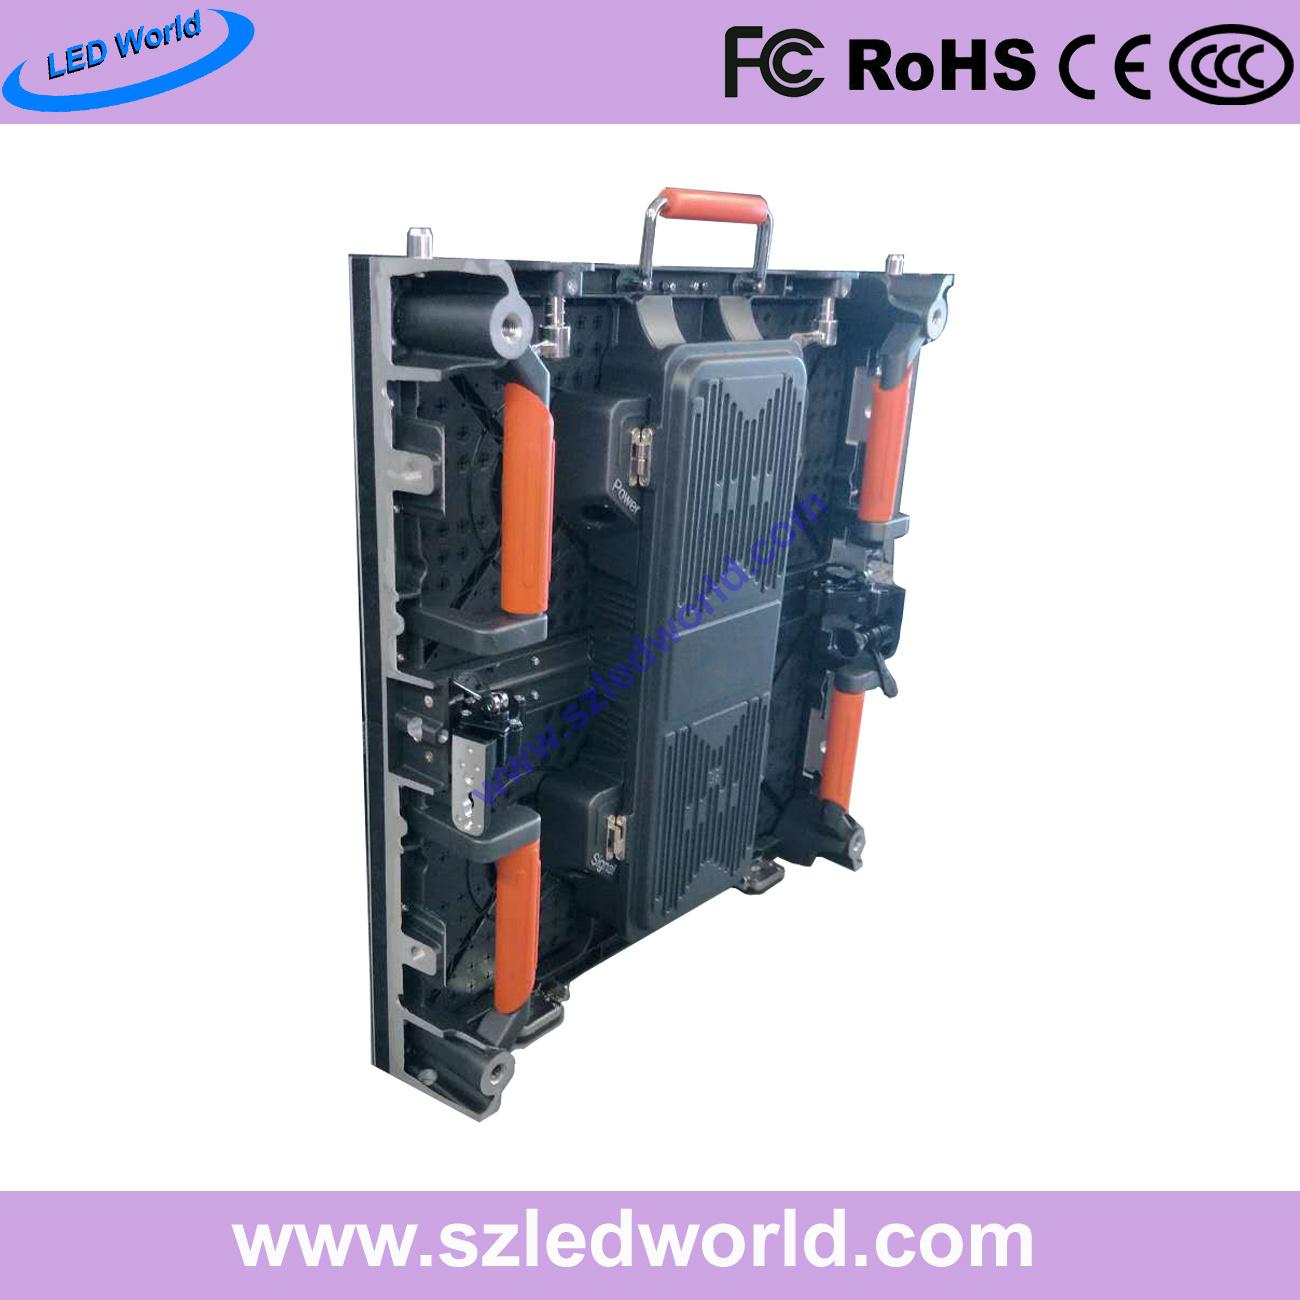 Outdoor/Indoor Rental LED Display Screen Panel Advertising Board (P3.91, P4.81, P5.95, P6.25)